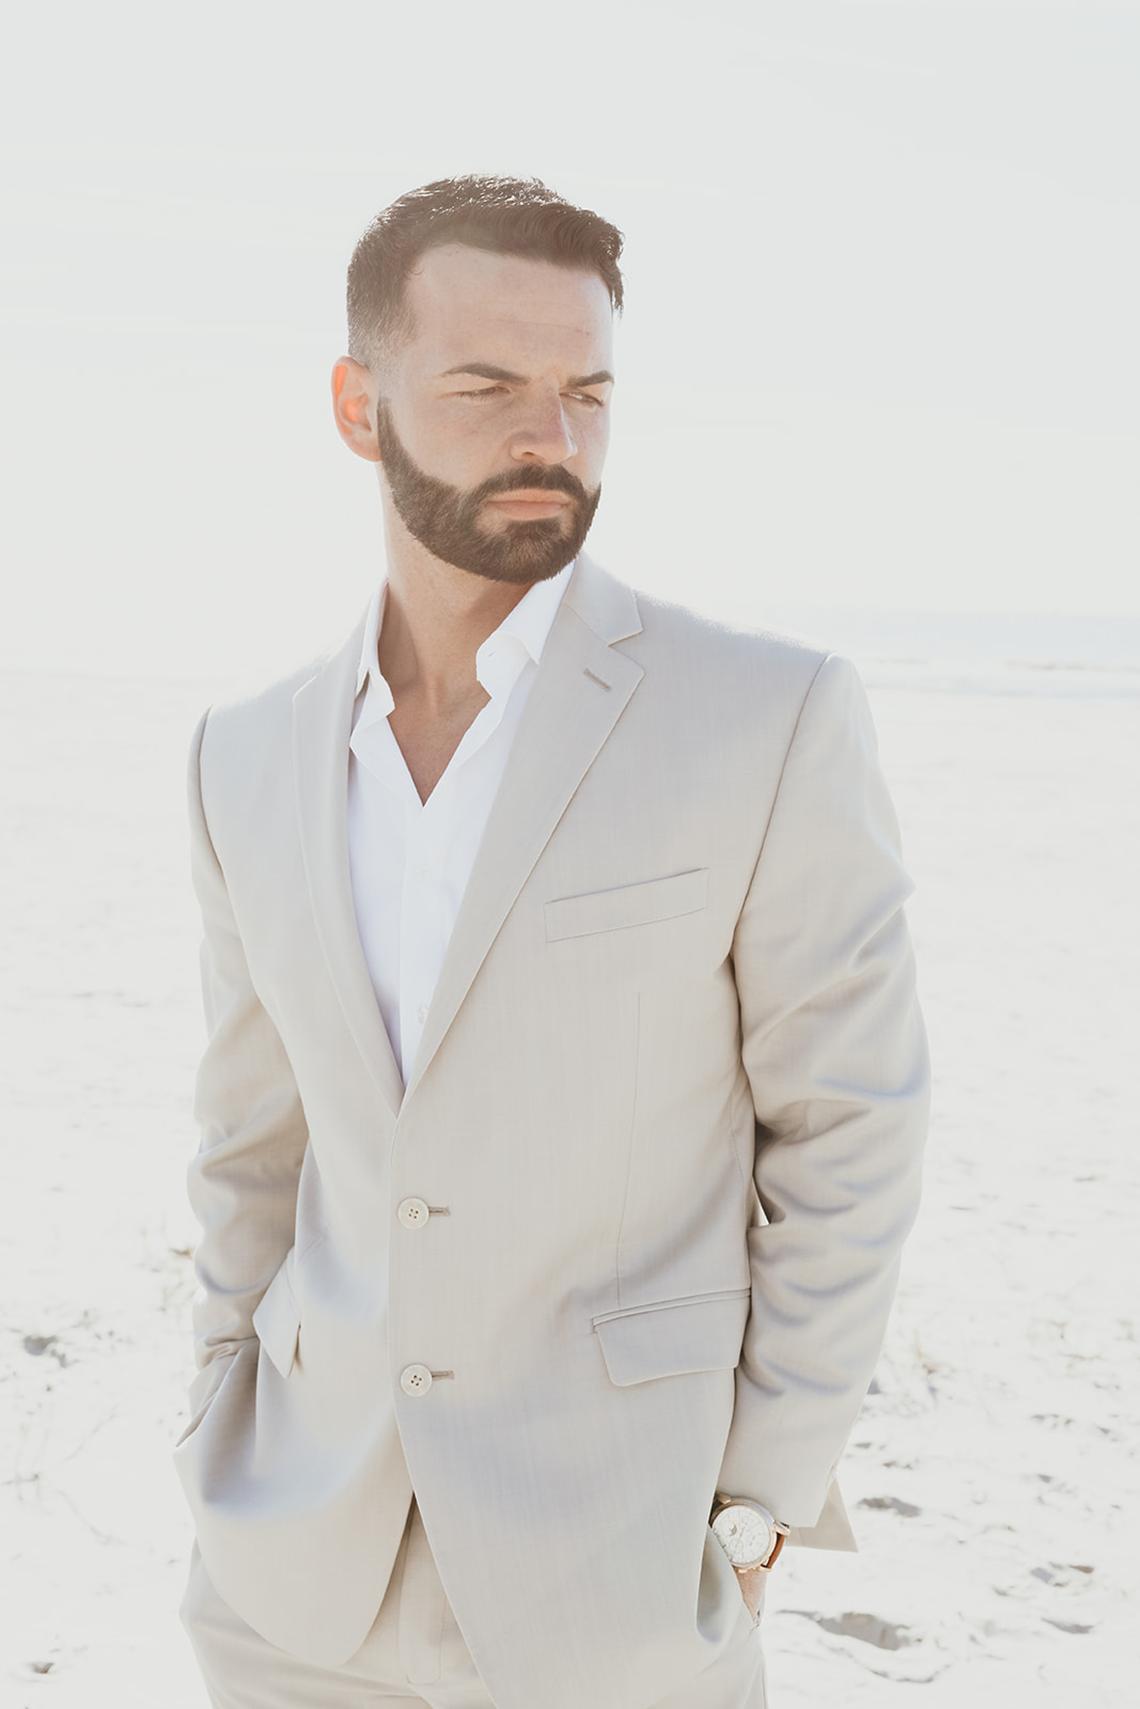 Bohemian Beach Wedding Inspiration With Agave Decor – Georgia Grace – Salt and Stem 21